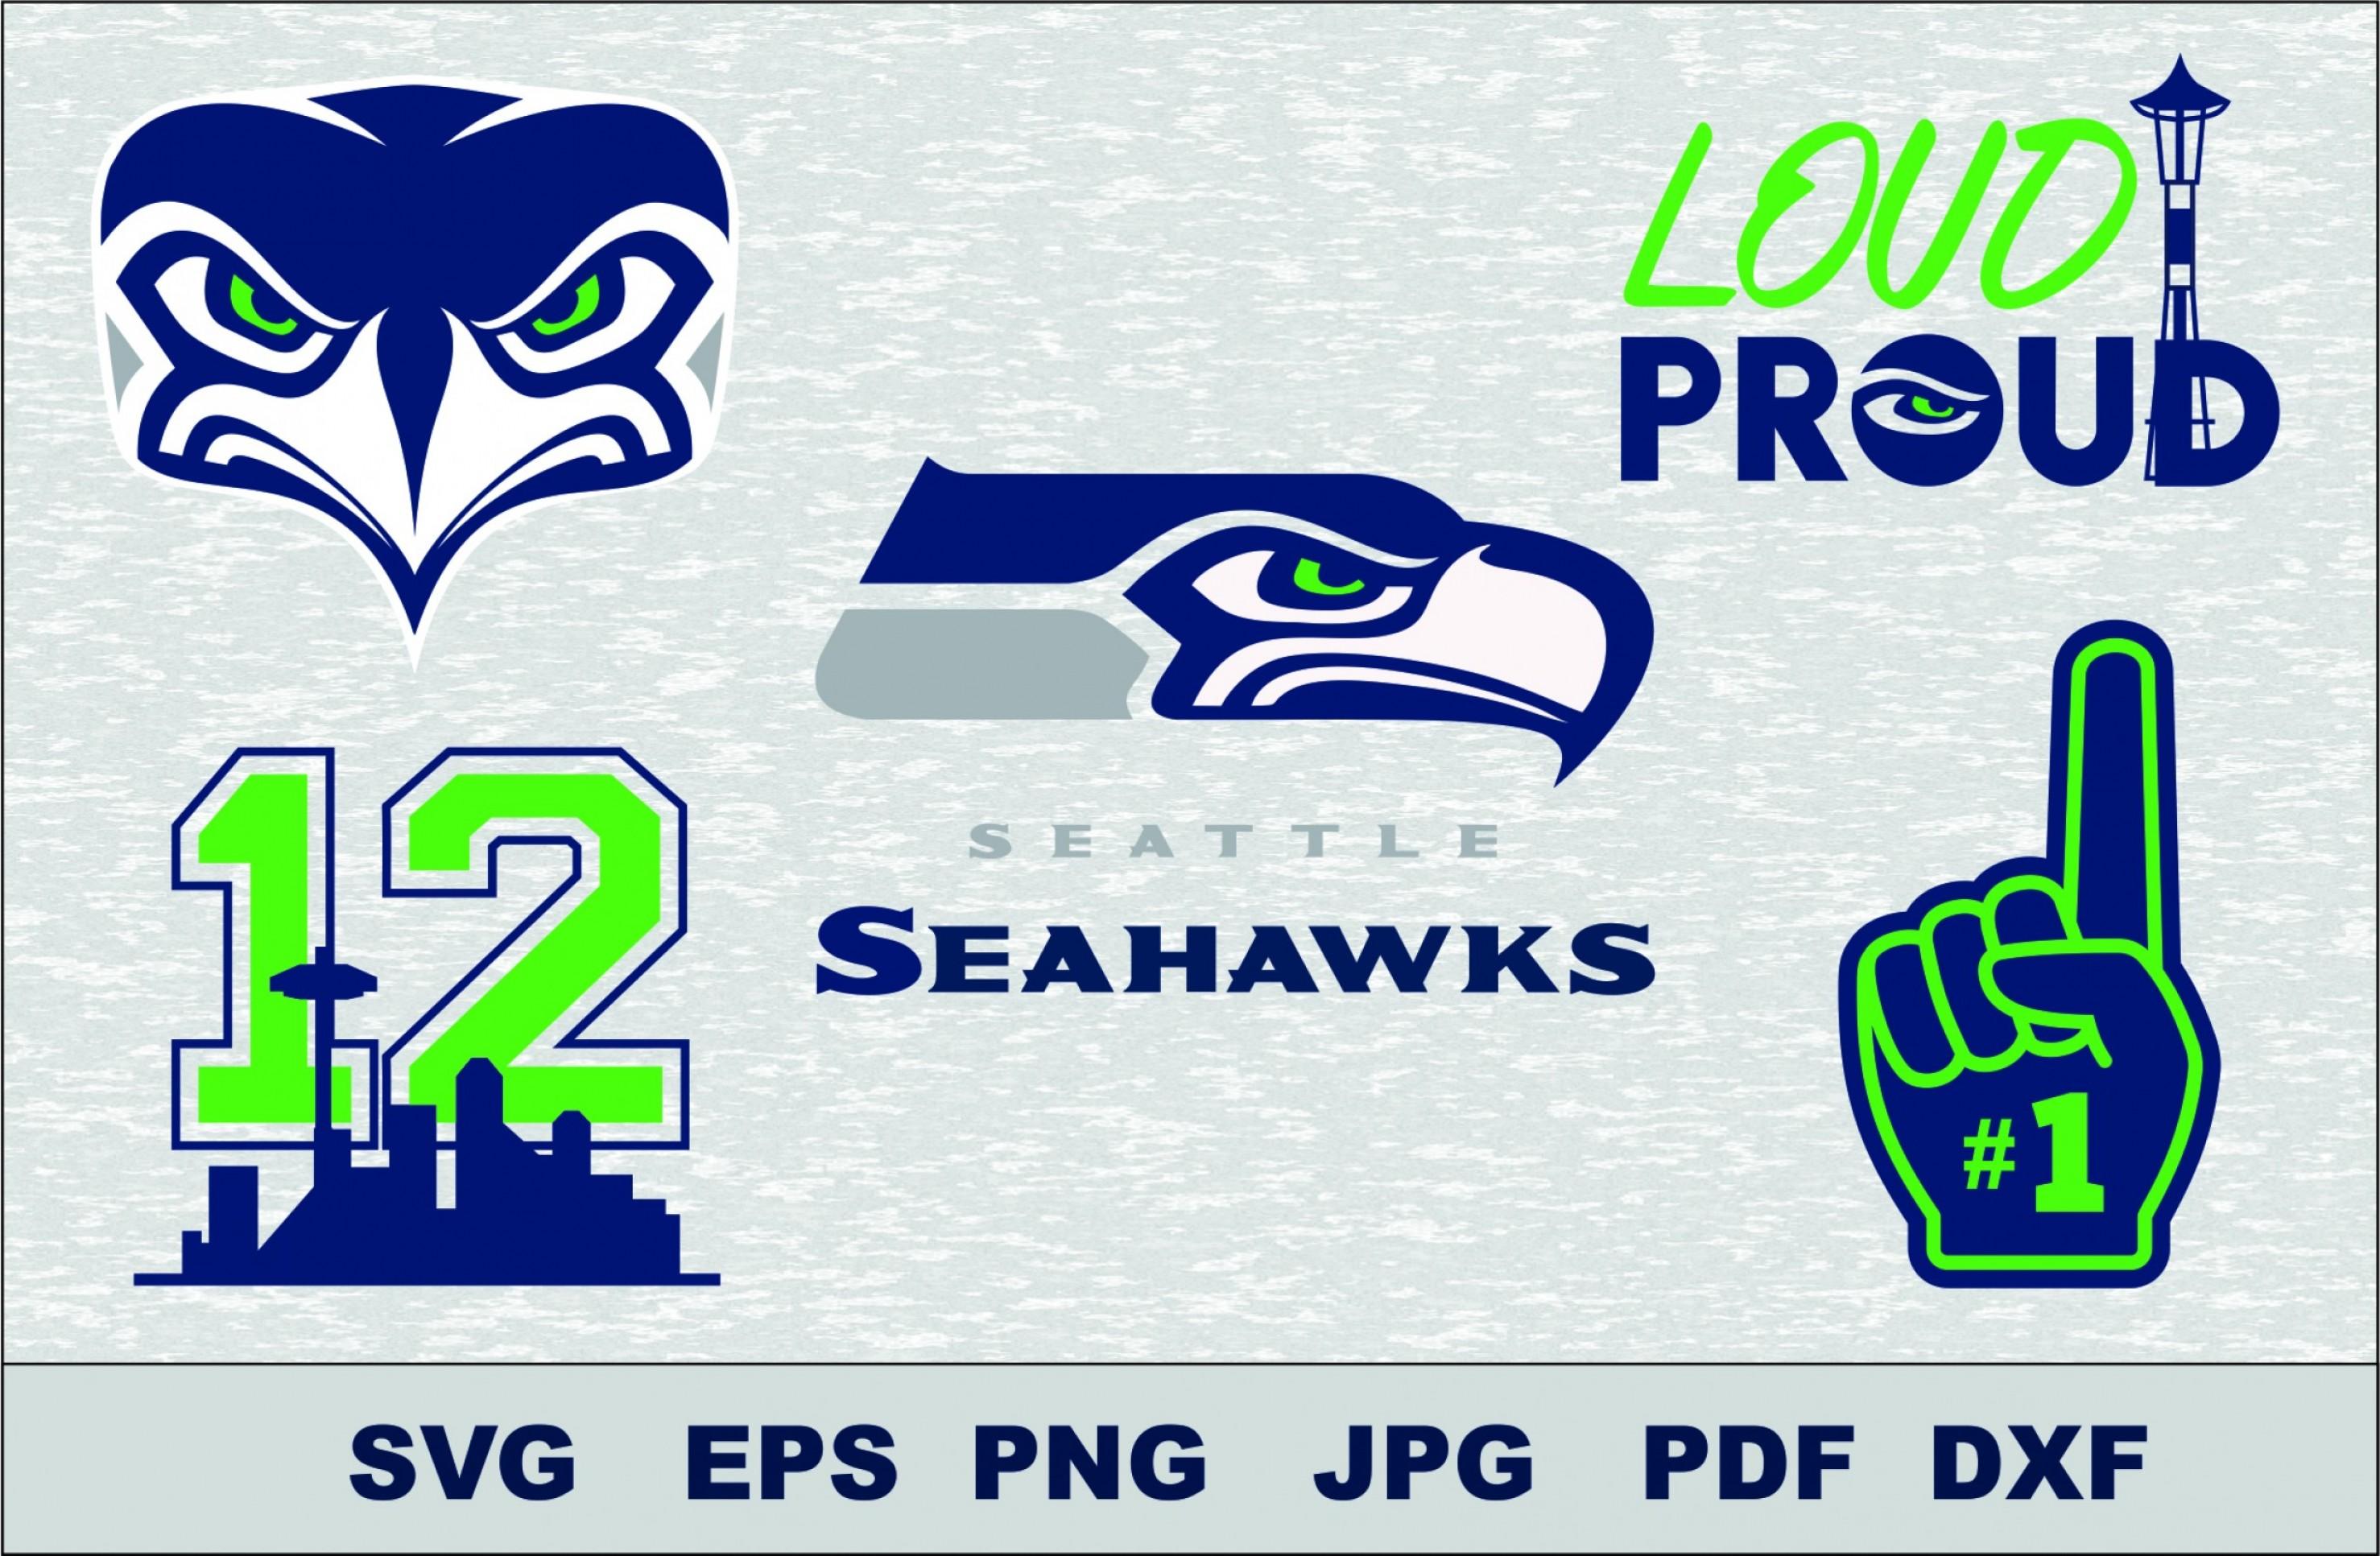 Seattle Seahawks Svg Dxf Logo Silhouette Studio Transfer.